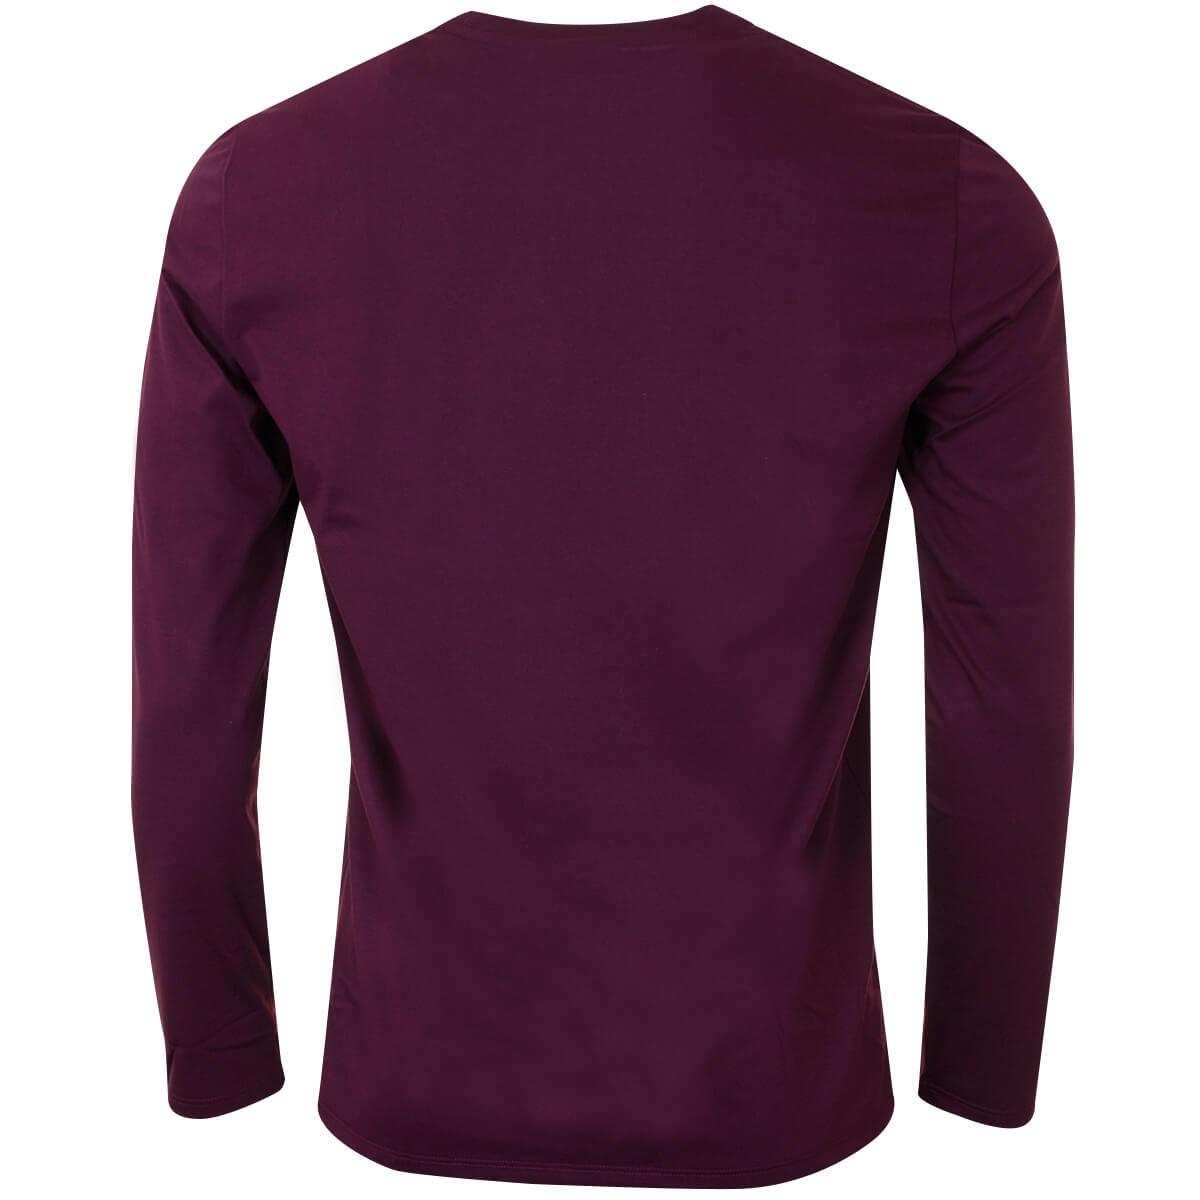 Lacoste-Mens-2019-LS-Crew-Neck-Cotton-T-Shirt-TH6712-Long-Sleeve-Tee thumbnail 5